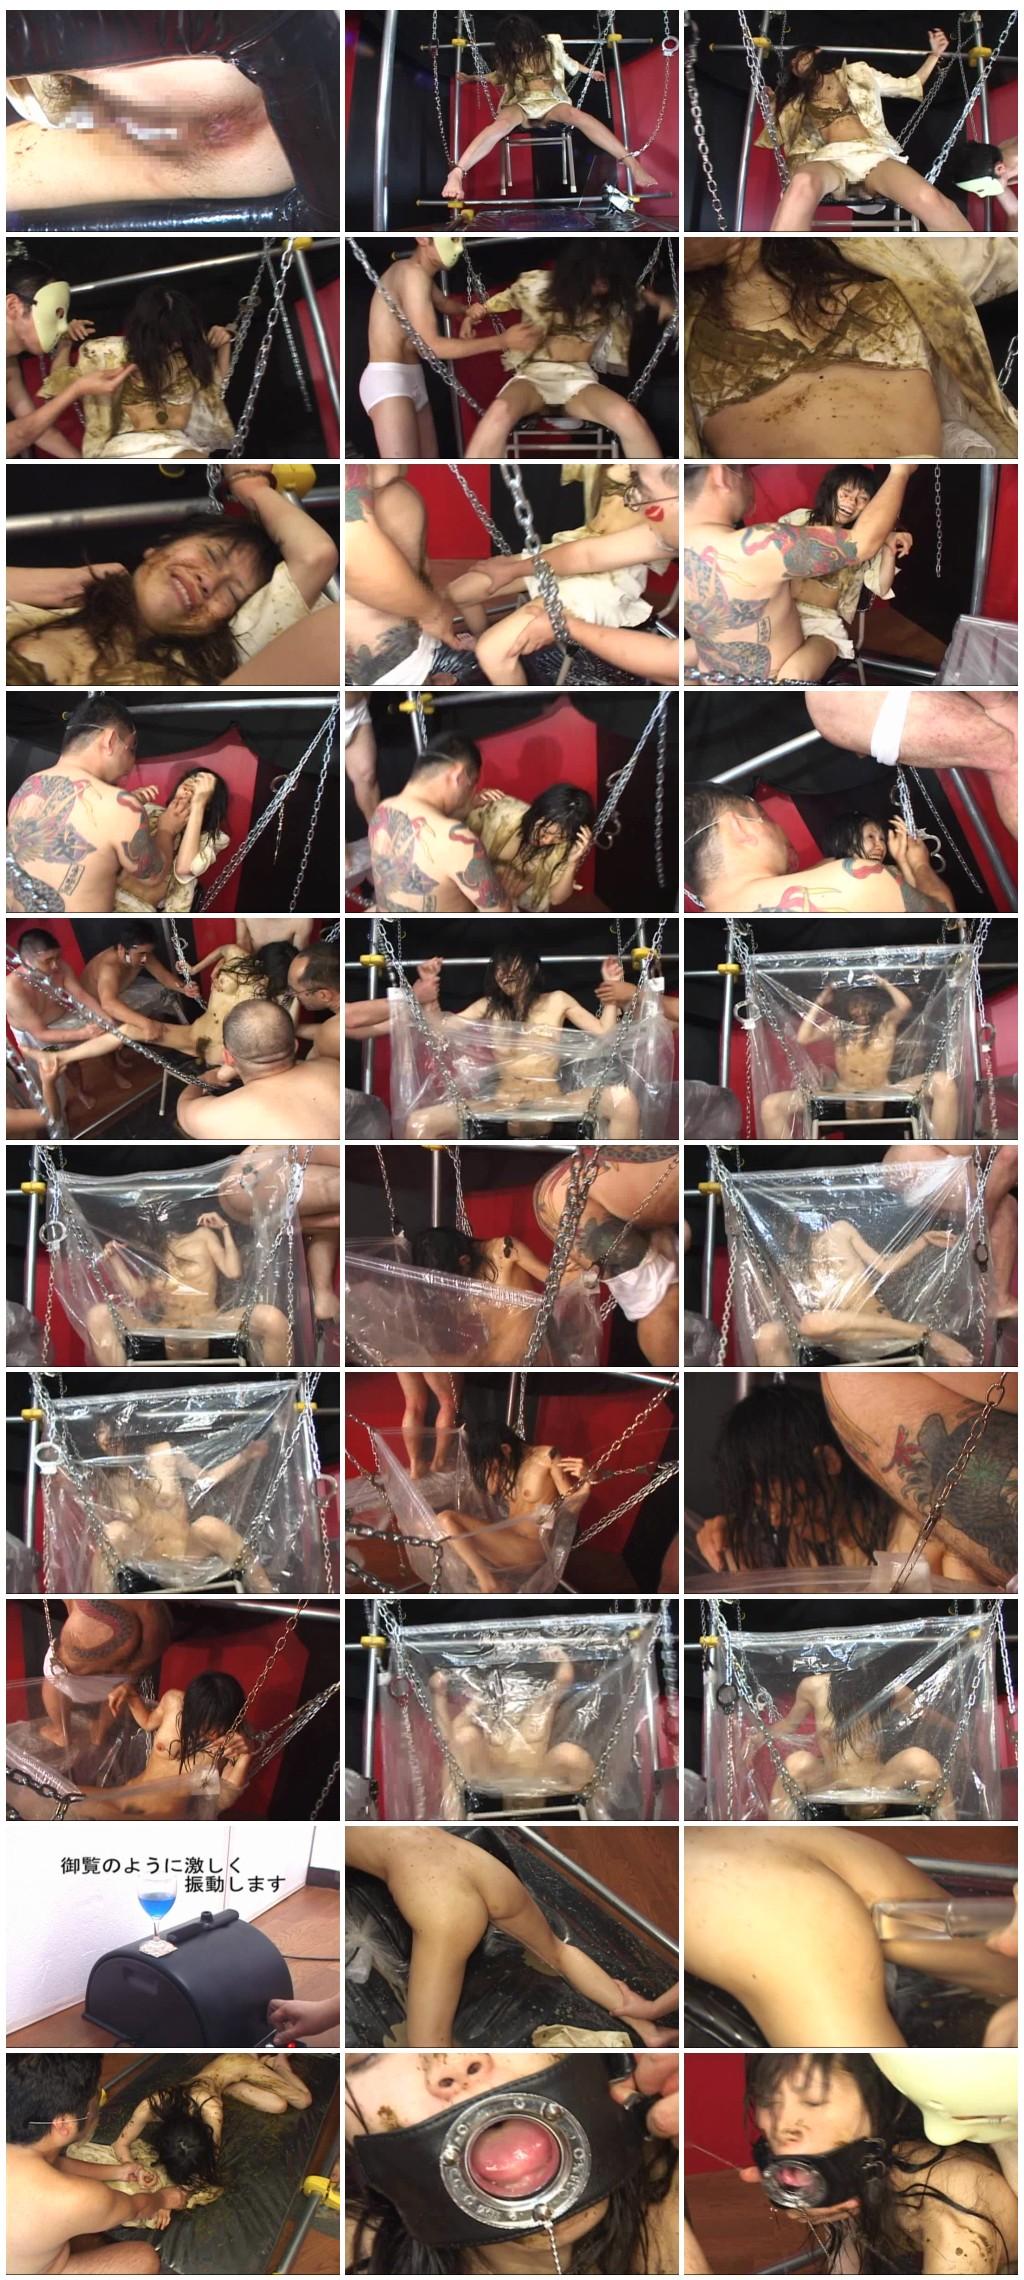 Precious Shit People 11Scat sex Enema Pissing Rape Humiliation Group Sex Fucking Machine shit sexOral Anal Sex SmearingSex Toys Masturbation shit defecation Toilet SlaveryB thumb - Precious Shit People 11[Scat sex, Enema, Pissing, Rape, Humiliation, Group Sex, Fucking Machine, shit sex,Oral-Anal Sex, Smearing,Sex Toys, Masturbation,  shit, defecation, Toilet Slavery]B